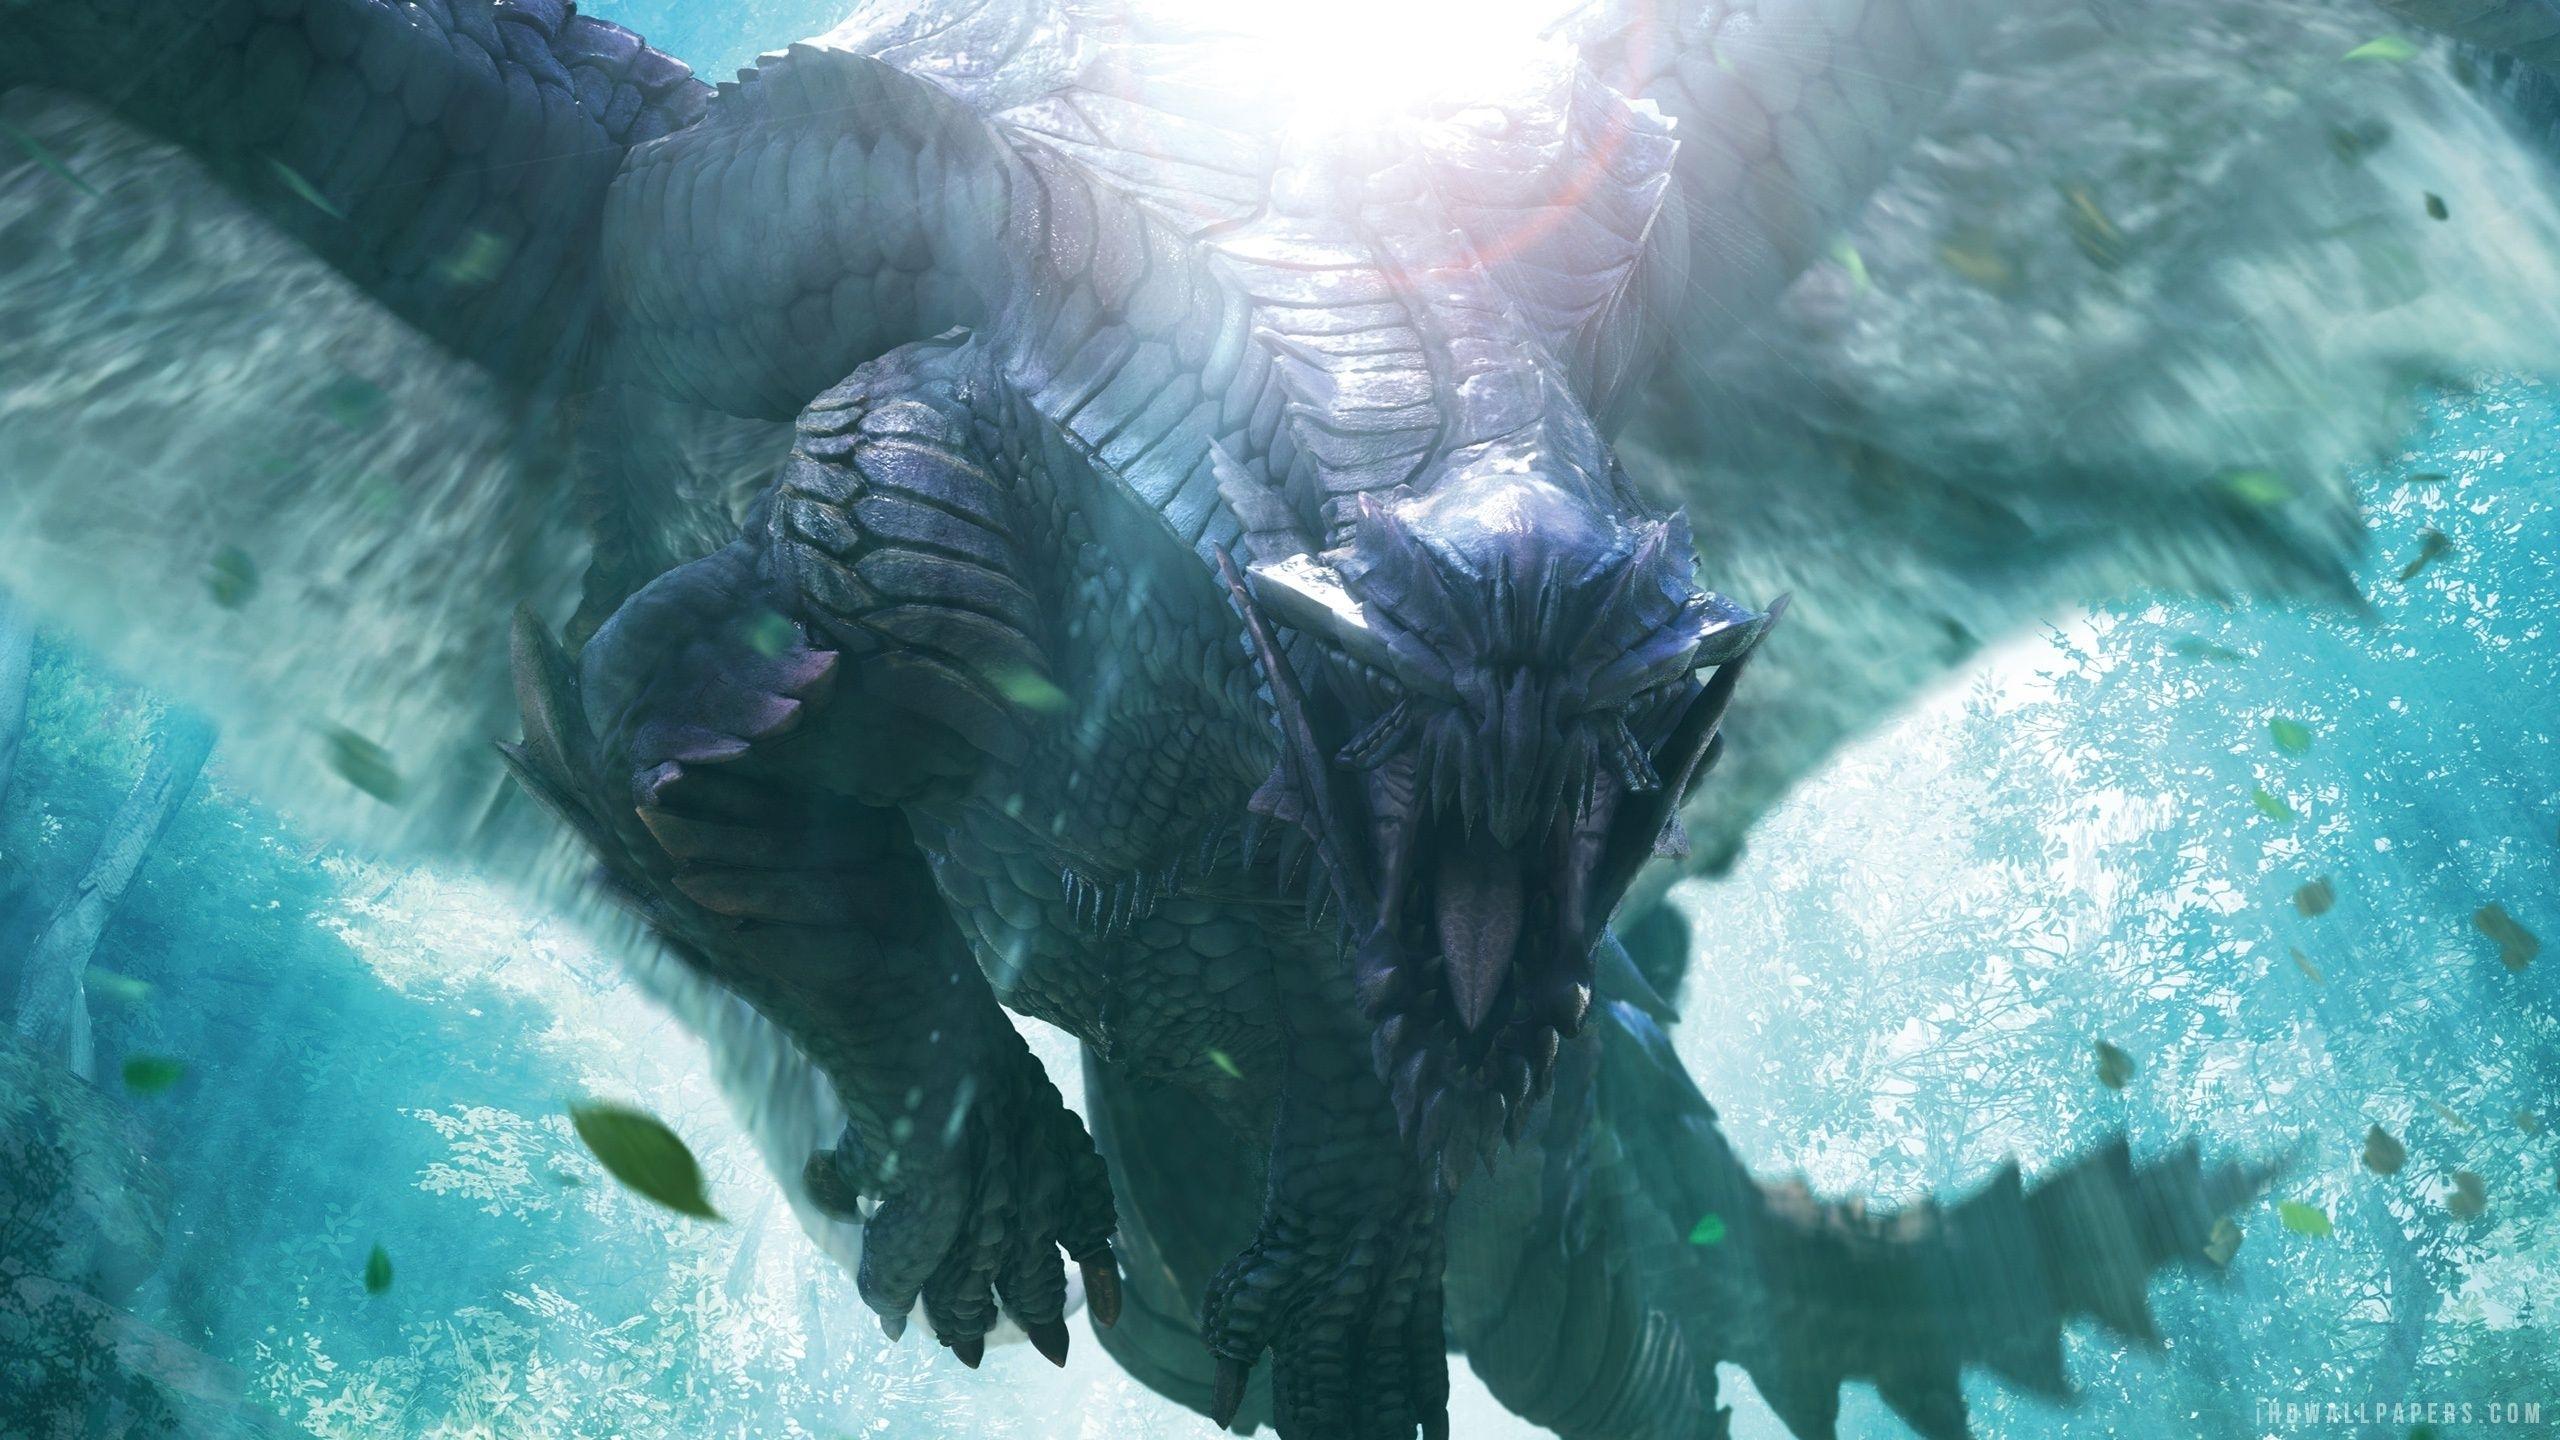 Épinglé par gaje steel sur monster hunter legends | pinterest